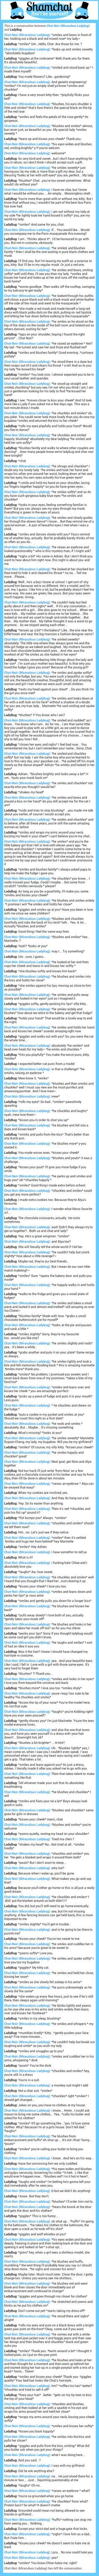 A conversation between LadyBug and Chat-Noir (Miraculous Ladybug)